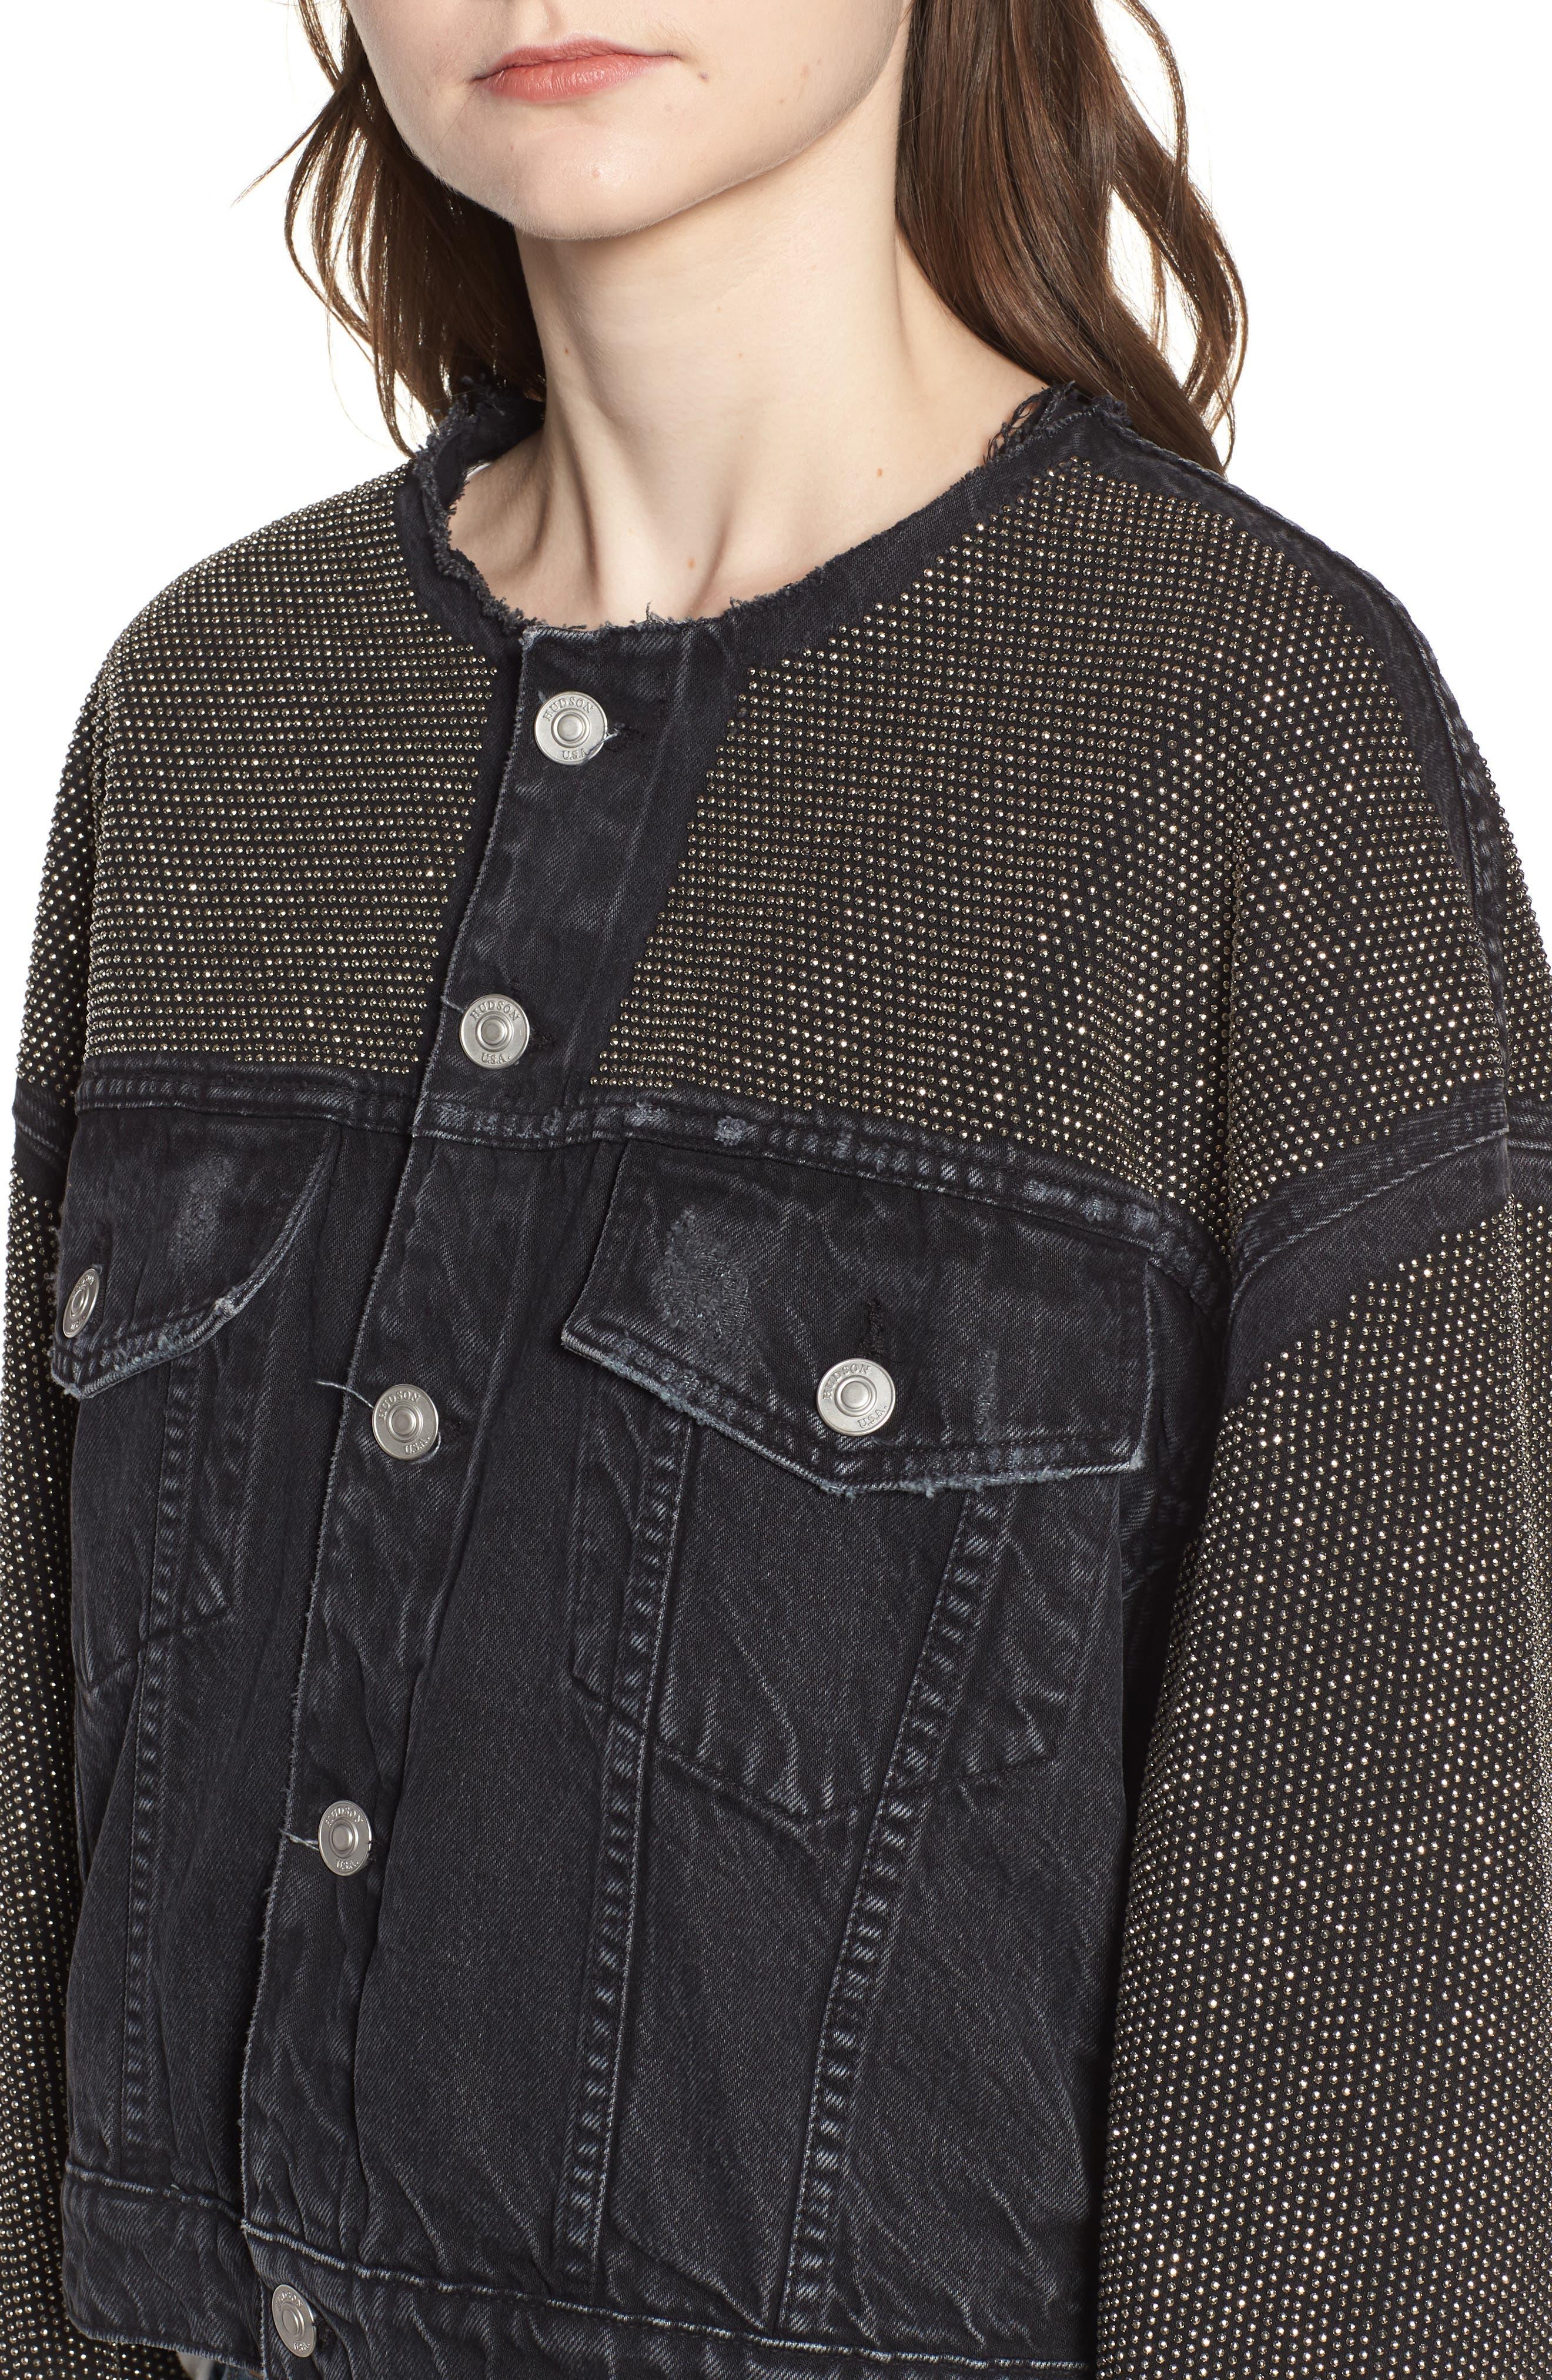 Rei Studded Crop Denim Jacket,                             Alternate thumbnail 4, color,                             001